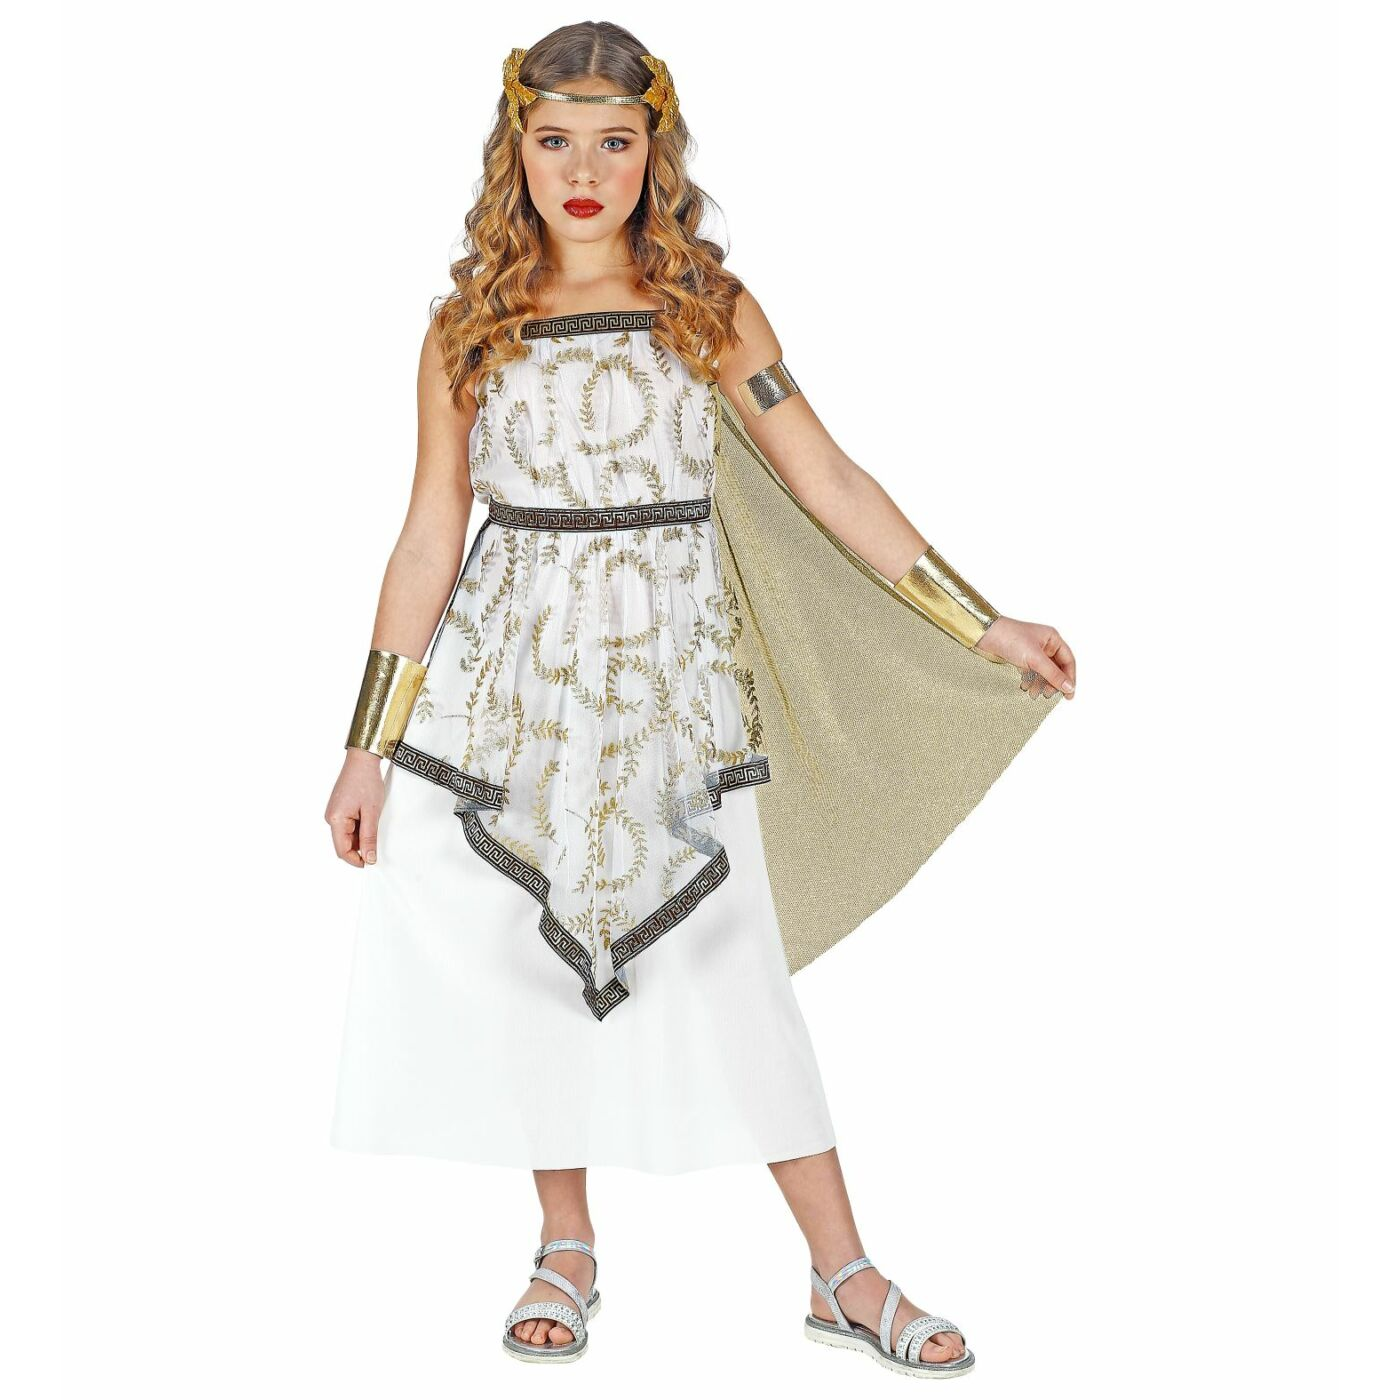 Görög istennő jelmez 128-as